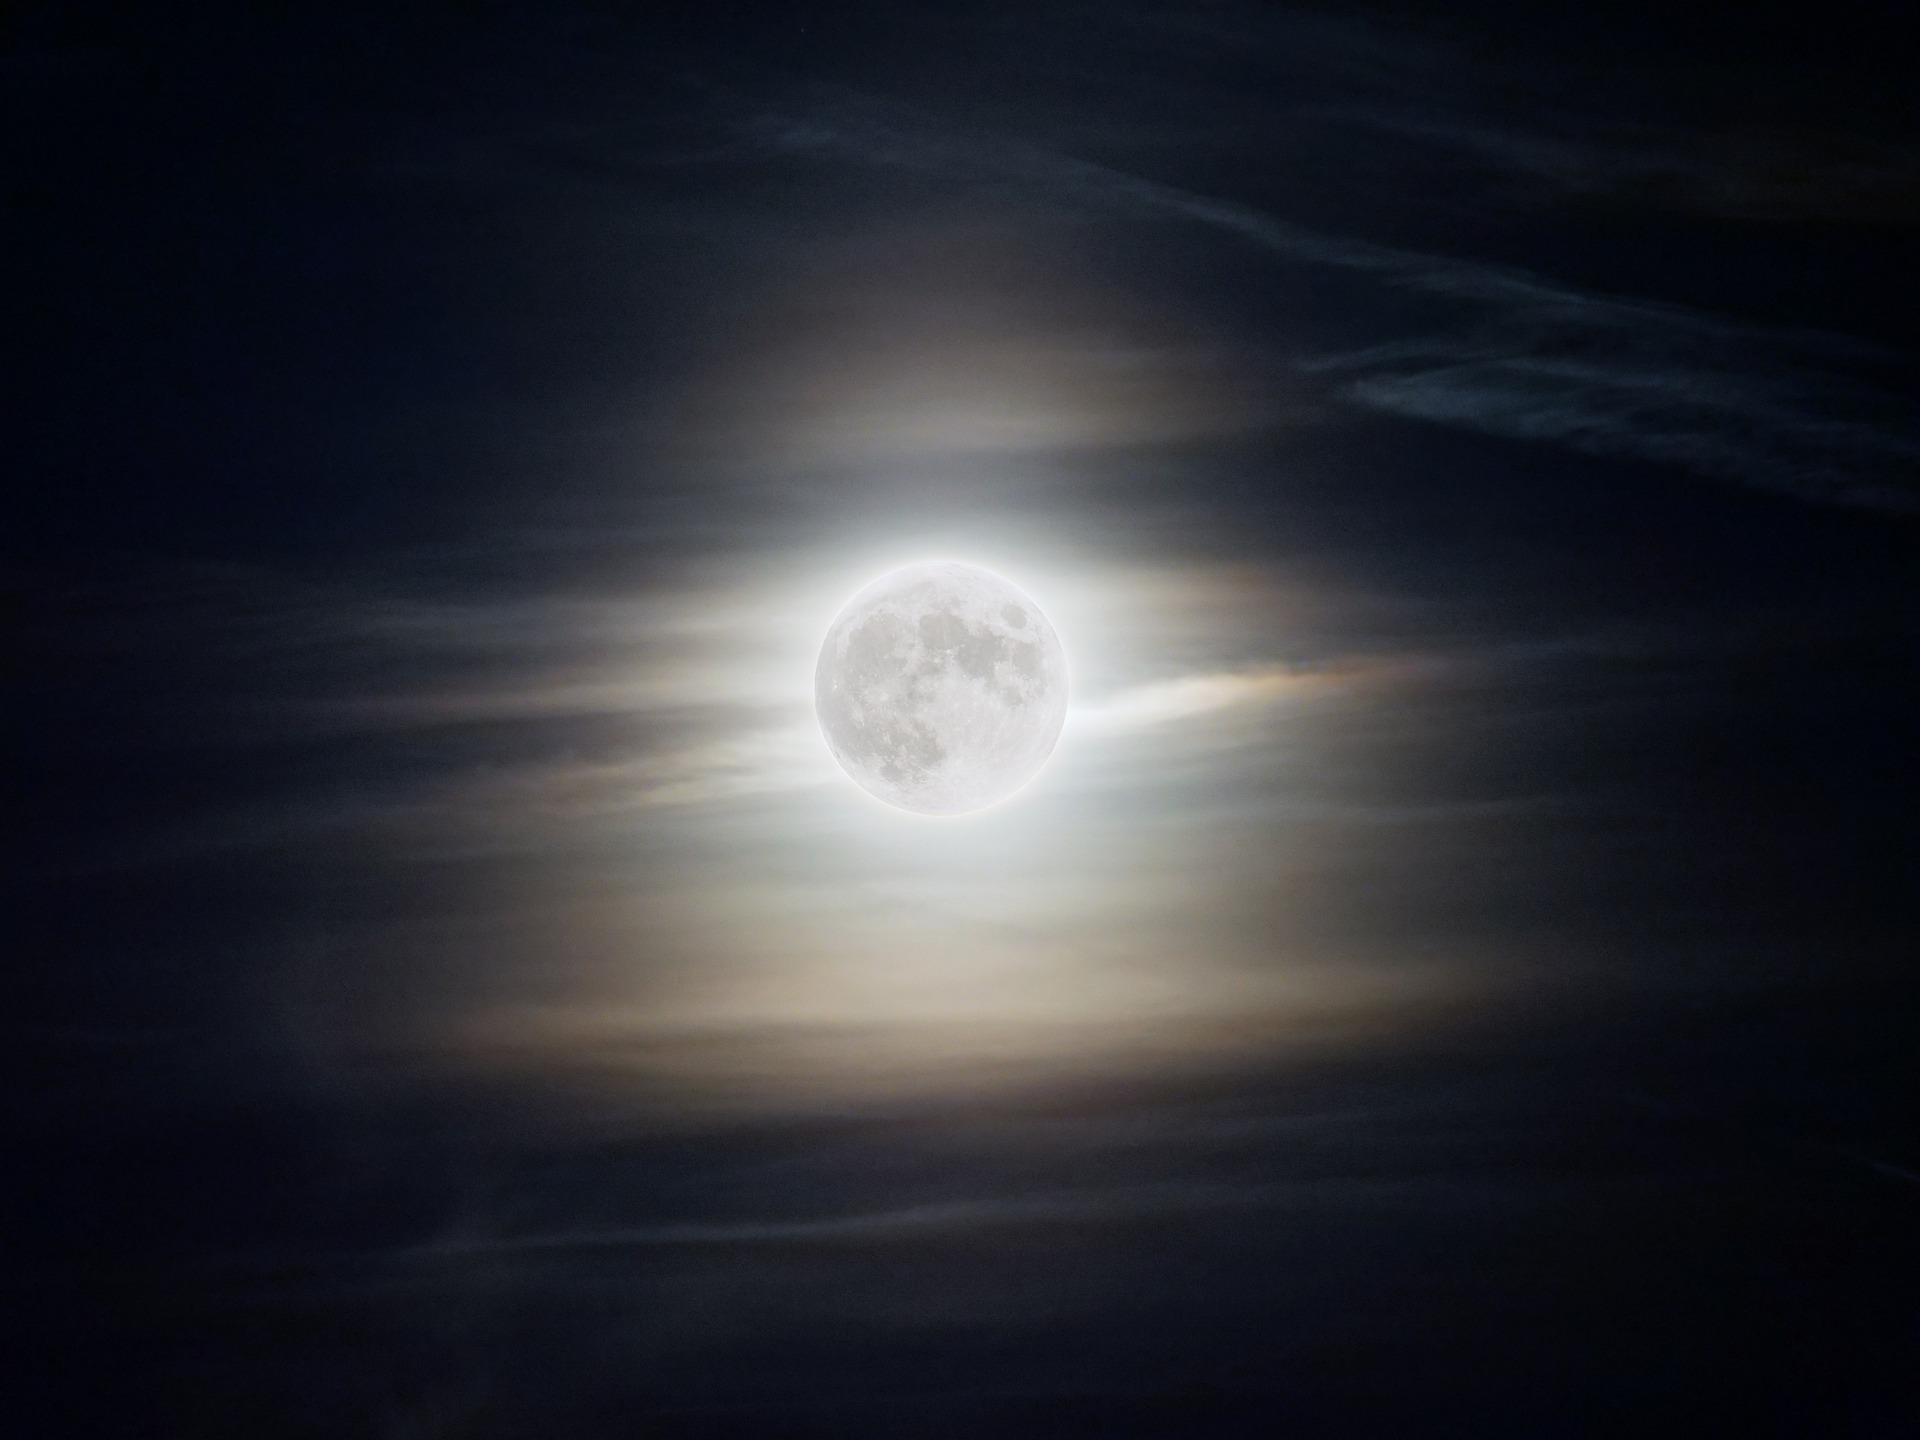 clair de lune 5372973 1920 1